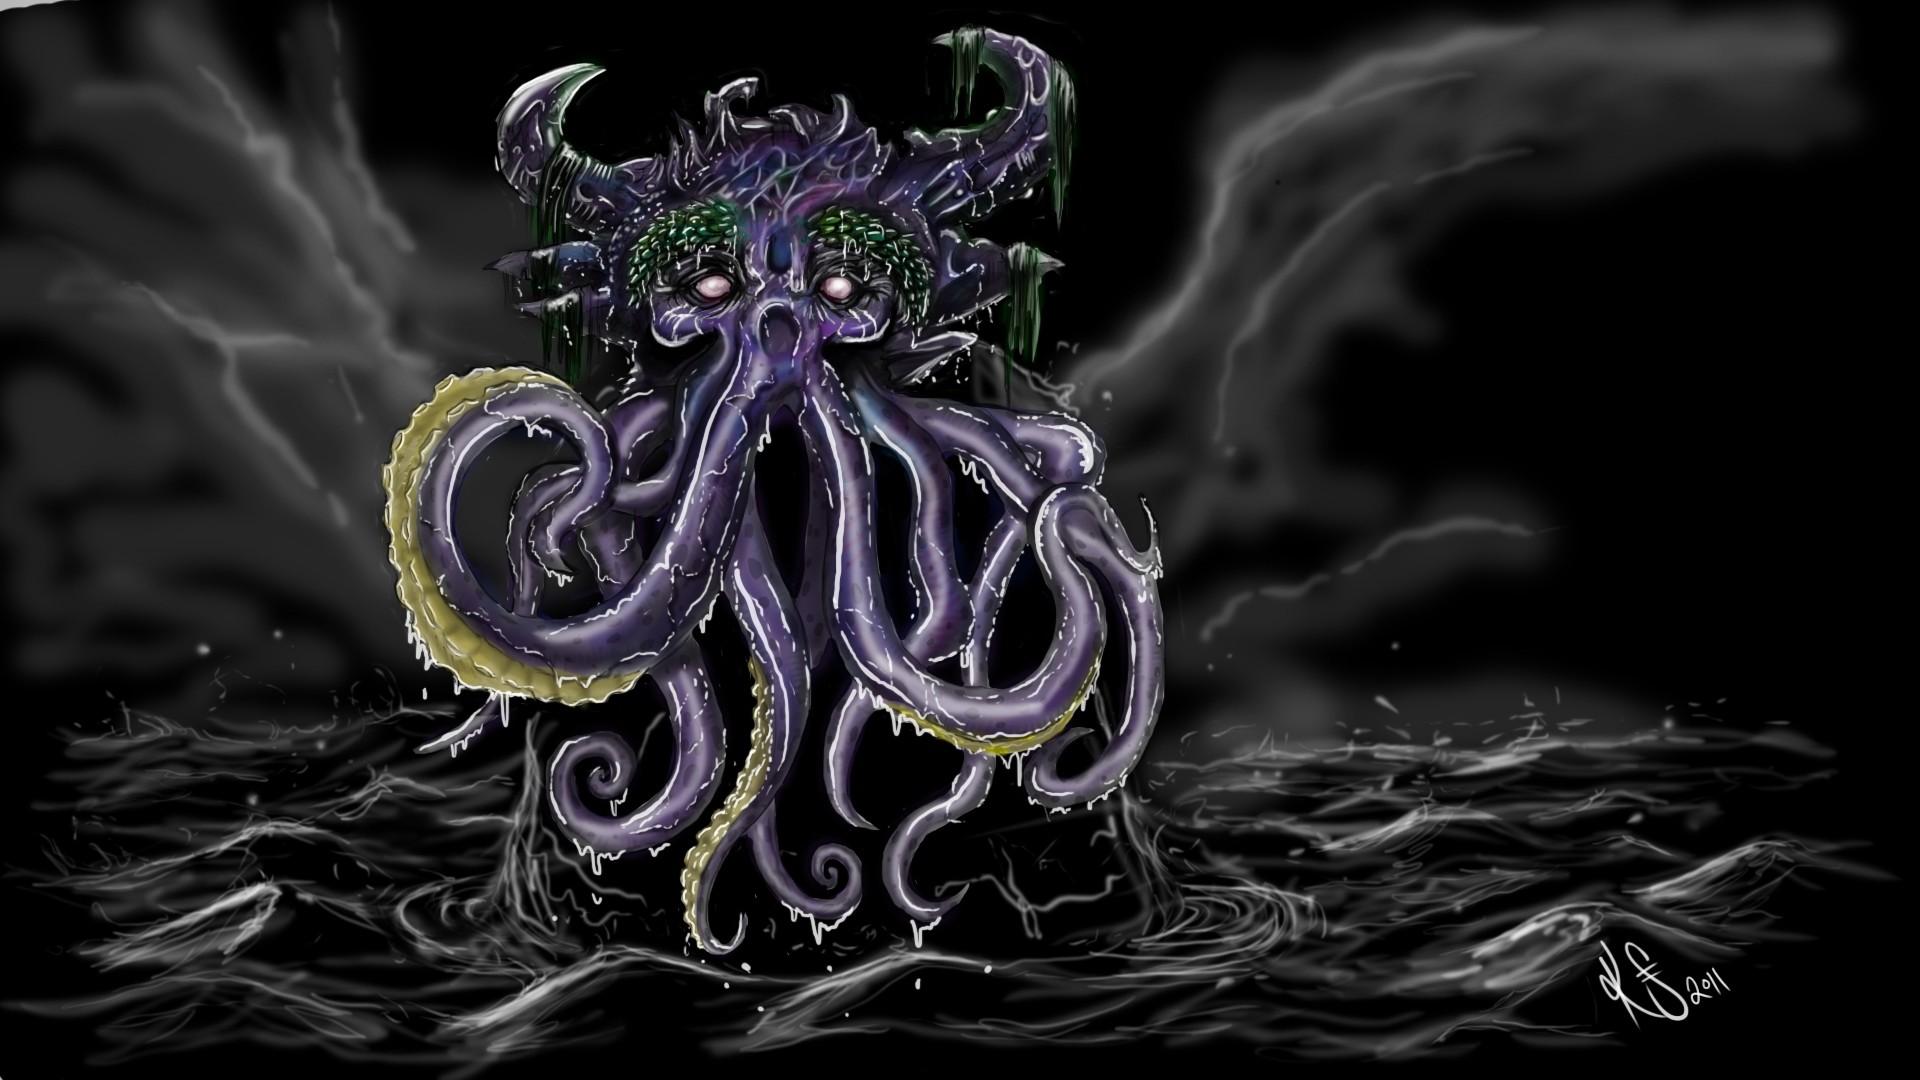 1 fantasy art dark monster creature octopus ocean sea storm sky clouds  waves cthulhu wallpaper |